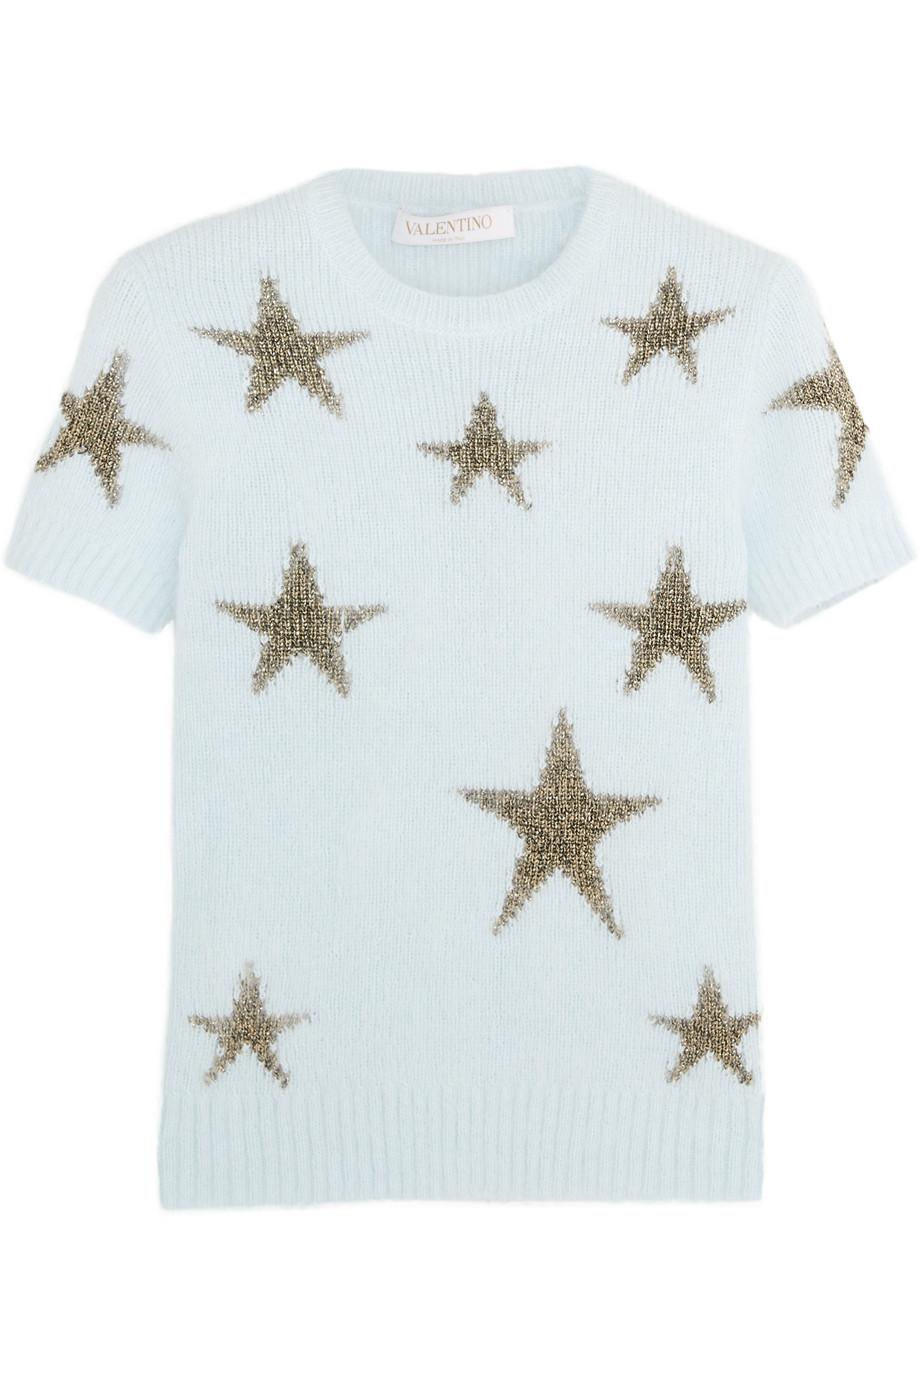 Valentino Star-Intarsia Angora-Blend Top, Size: XL